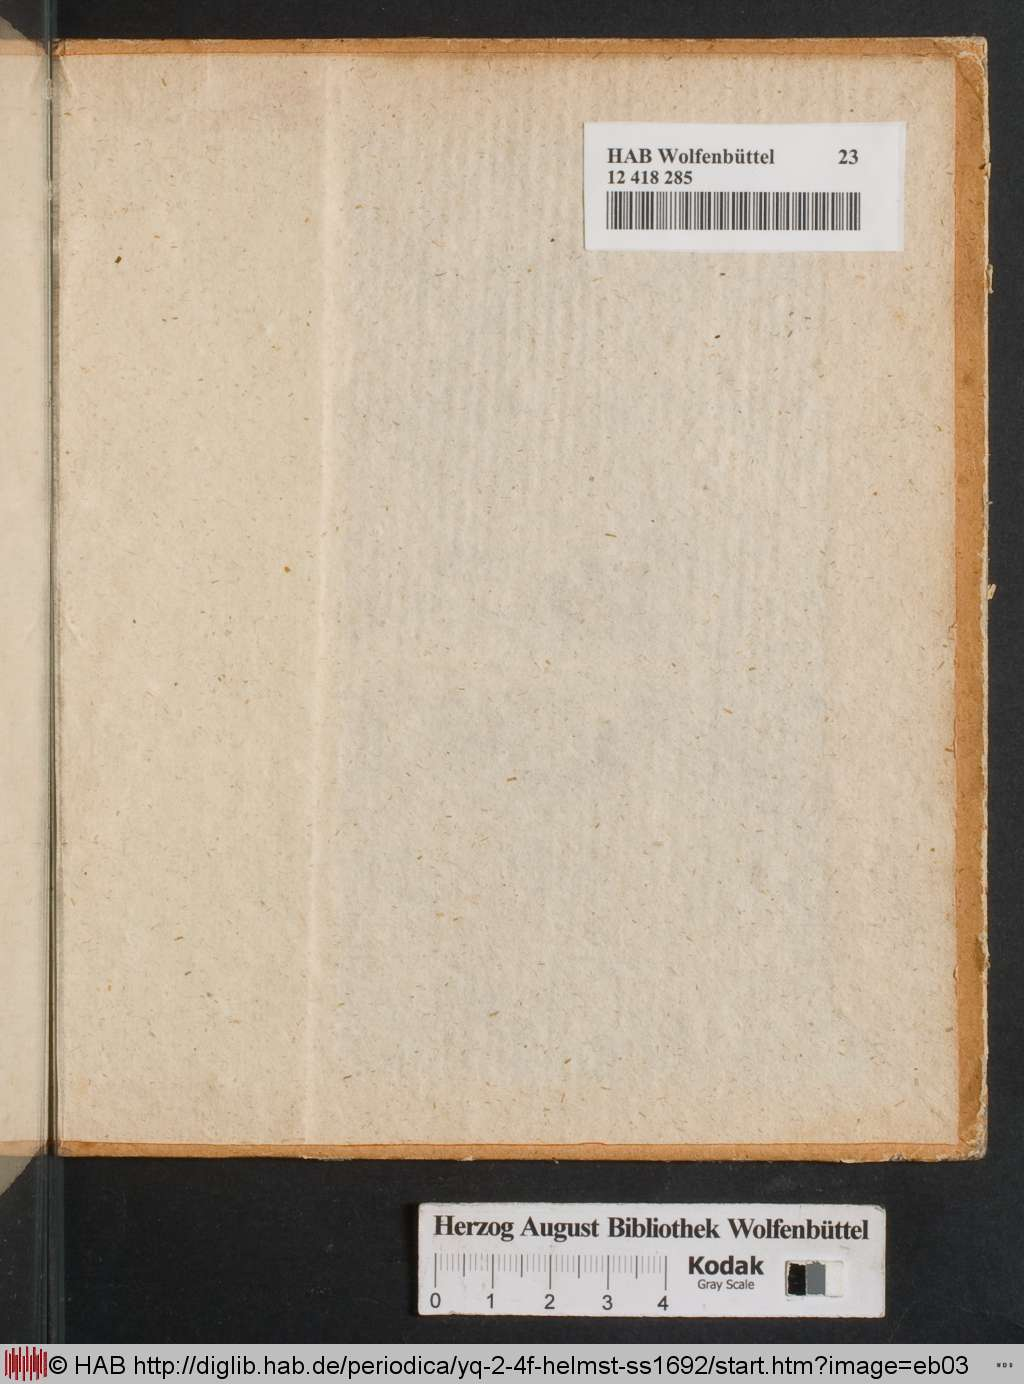 http://diglib.hab.de/periodica/yq-2-4f-helmst-ss1692/eb03.jpg